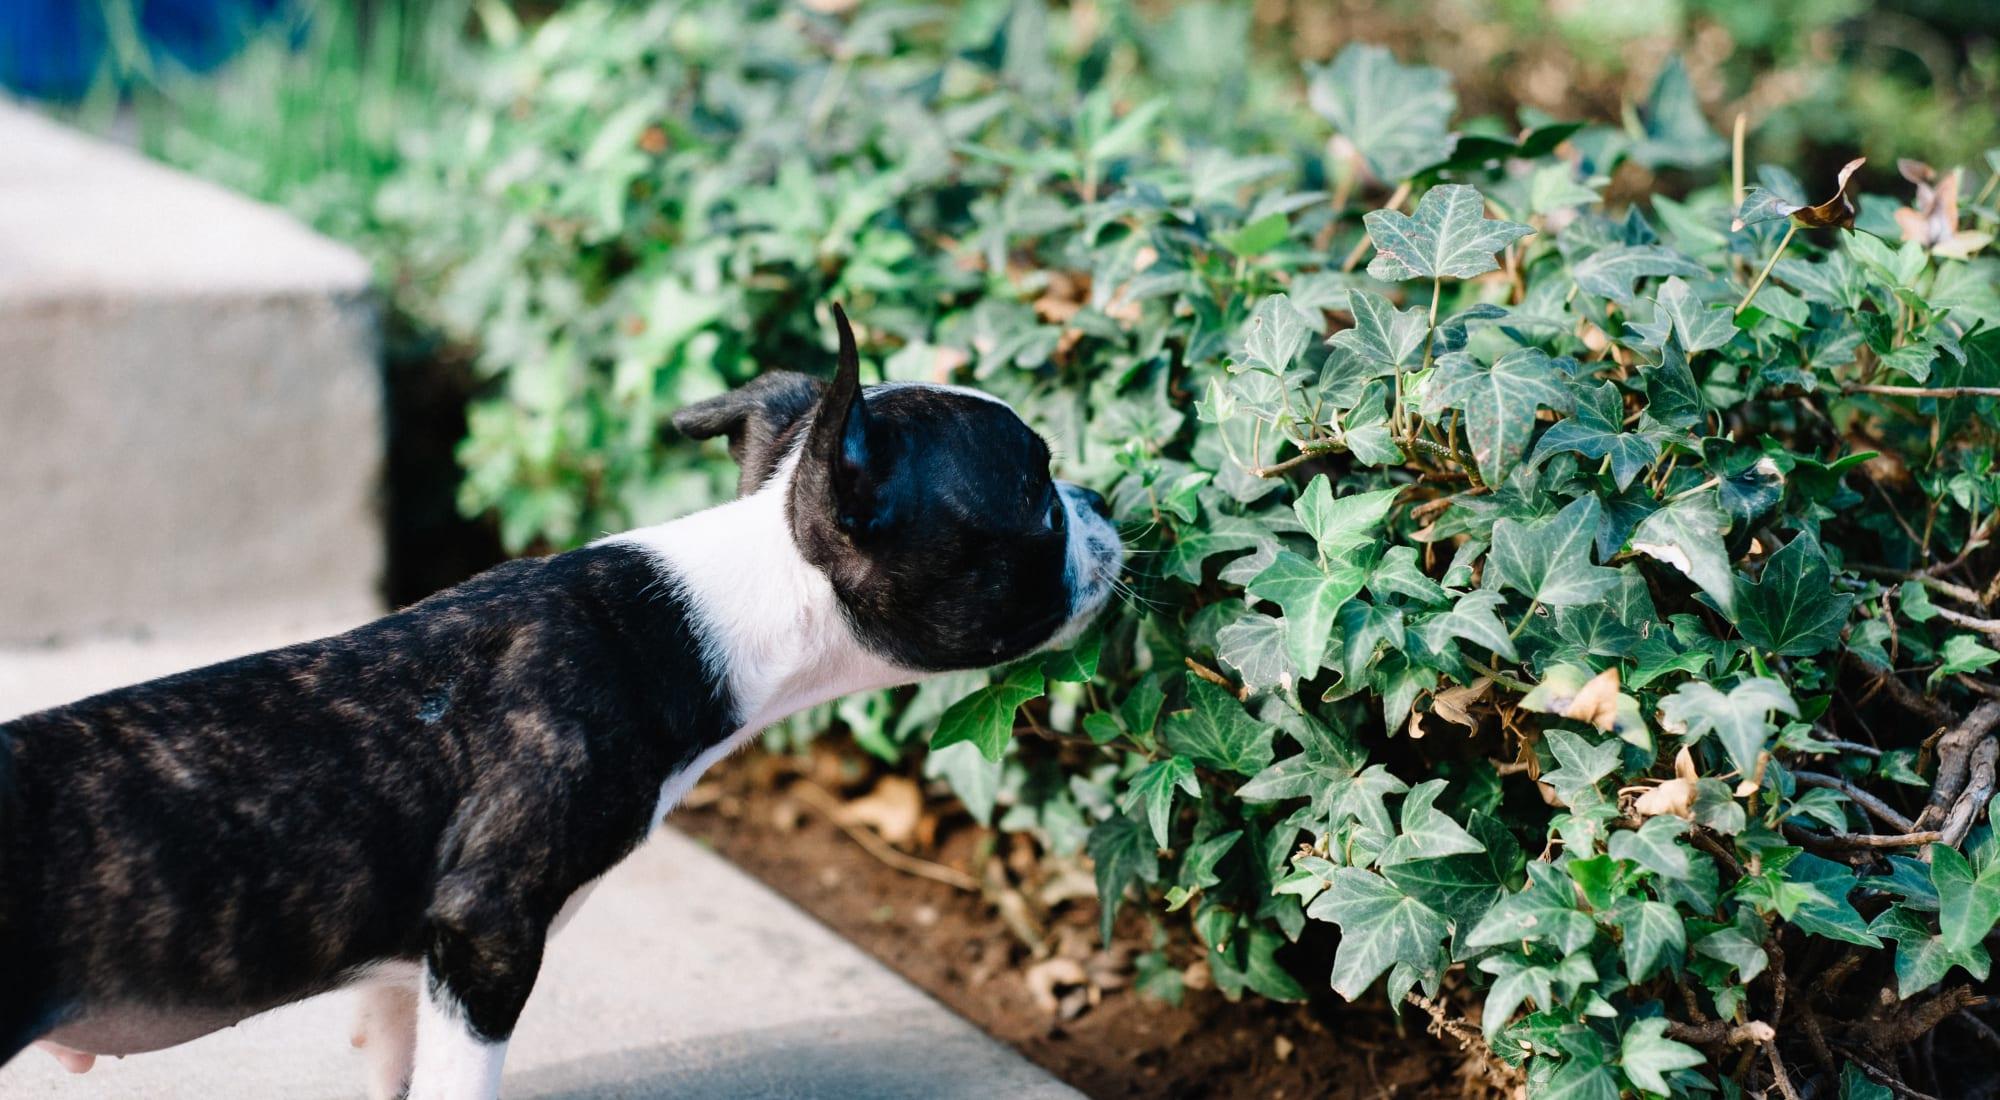 Pet-friendly apartments at Terra Apartment Homes in Federal Way, Washington